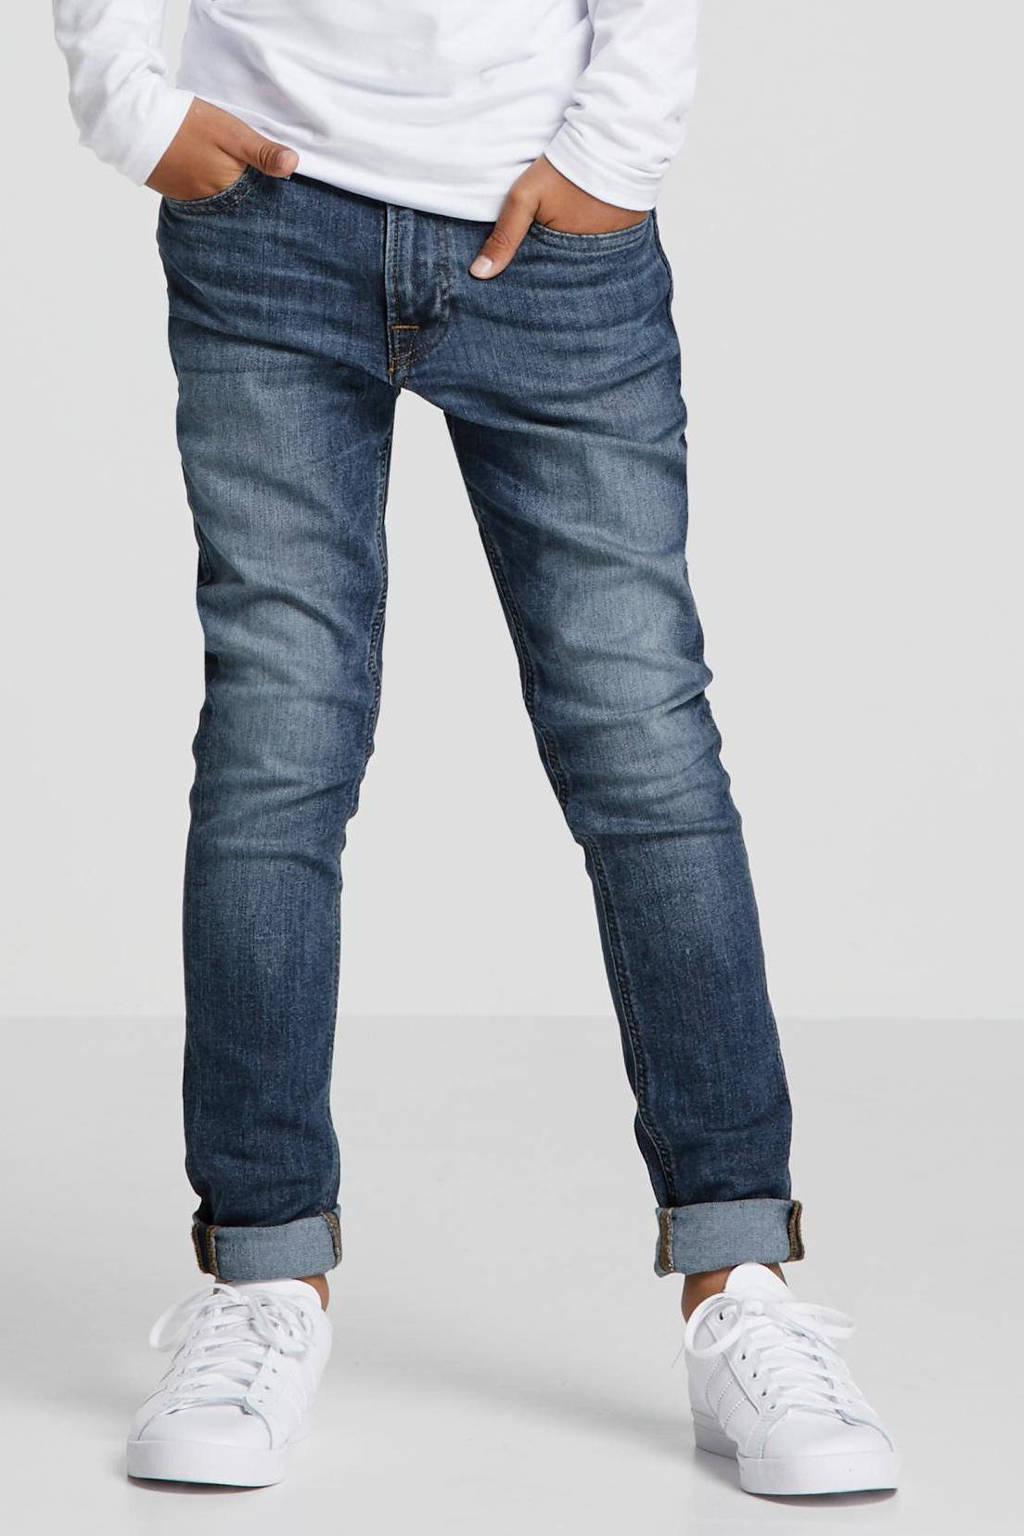 JACK & JONES JUNIOR slim fit jeans dark denim, Dark denim